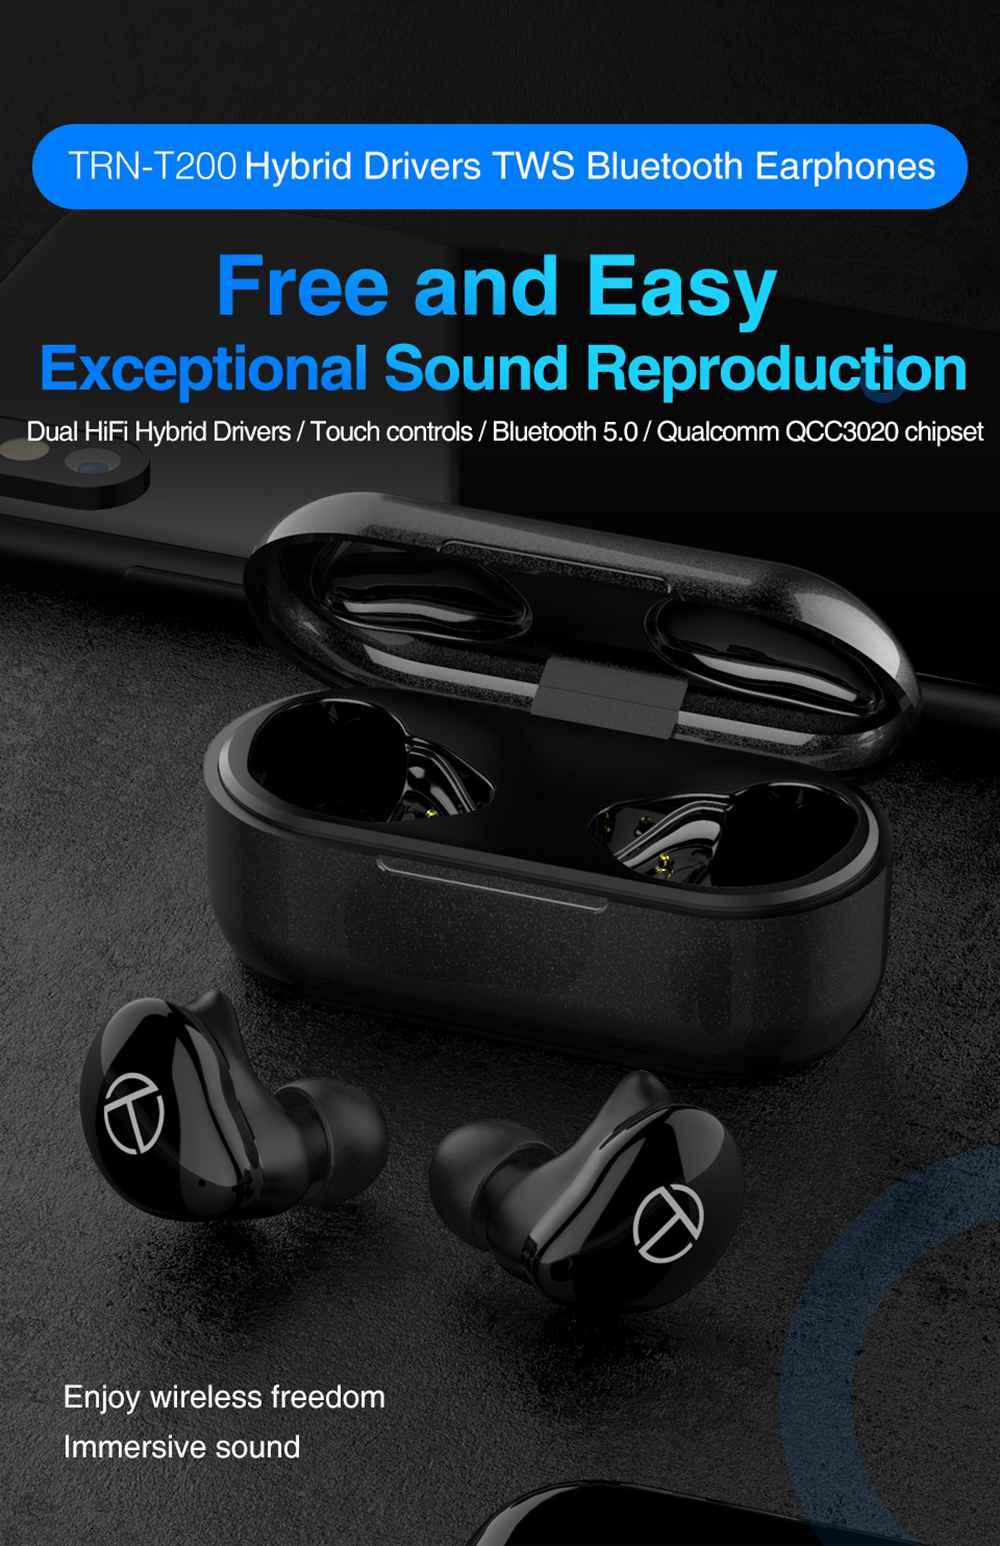 TRN T200 CVC 8.0 Earphones Qualcomm QCC3020 Volume Control aptX /AAC/ SBC Siri IPX5 7 Hours Playtime - Black